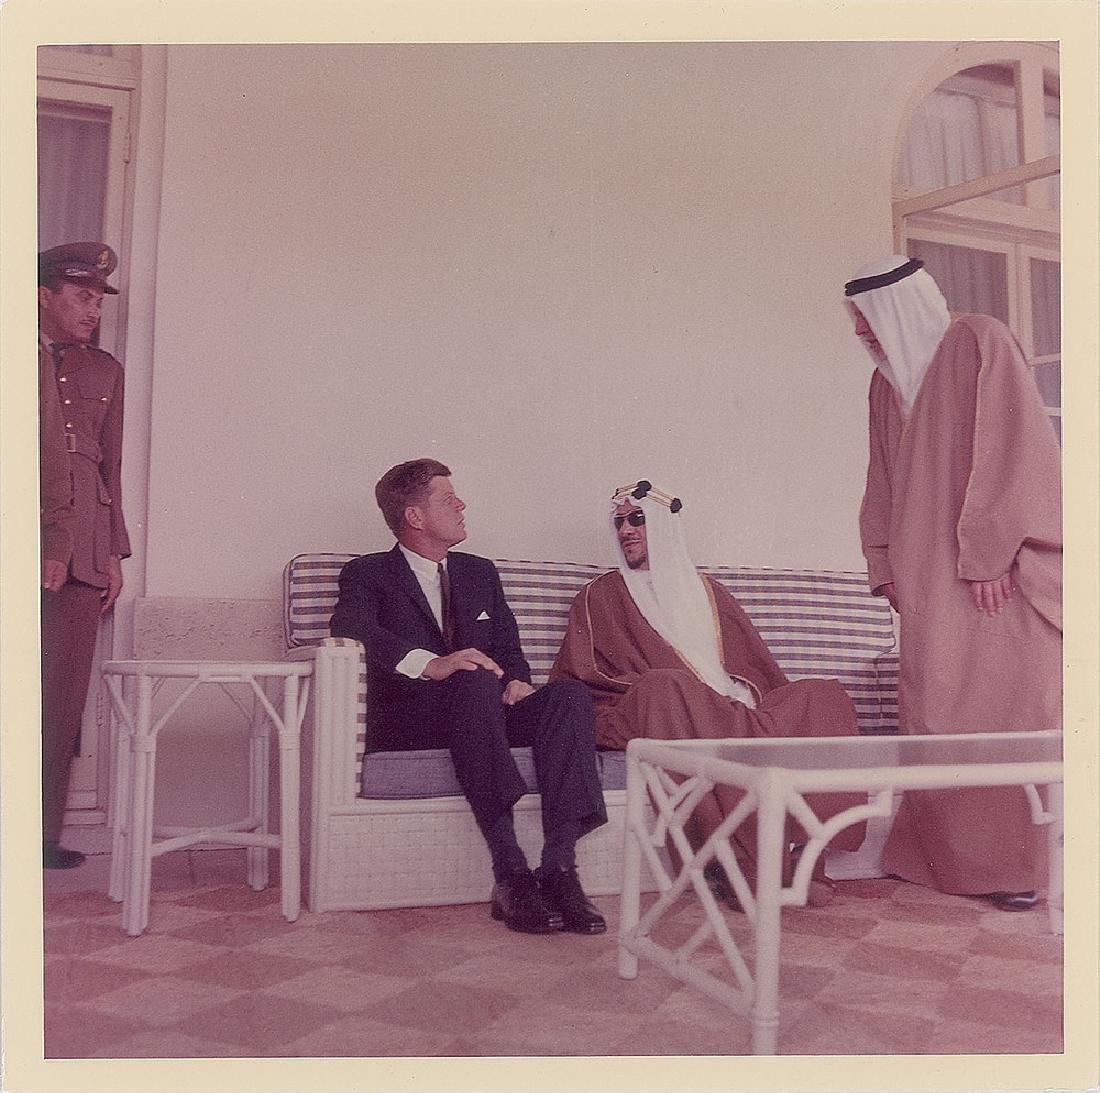 John F. Kennedy and Saud bin Abdulaziz Original Vintage Photograph by Cecil Stoughton